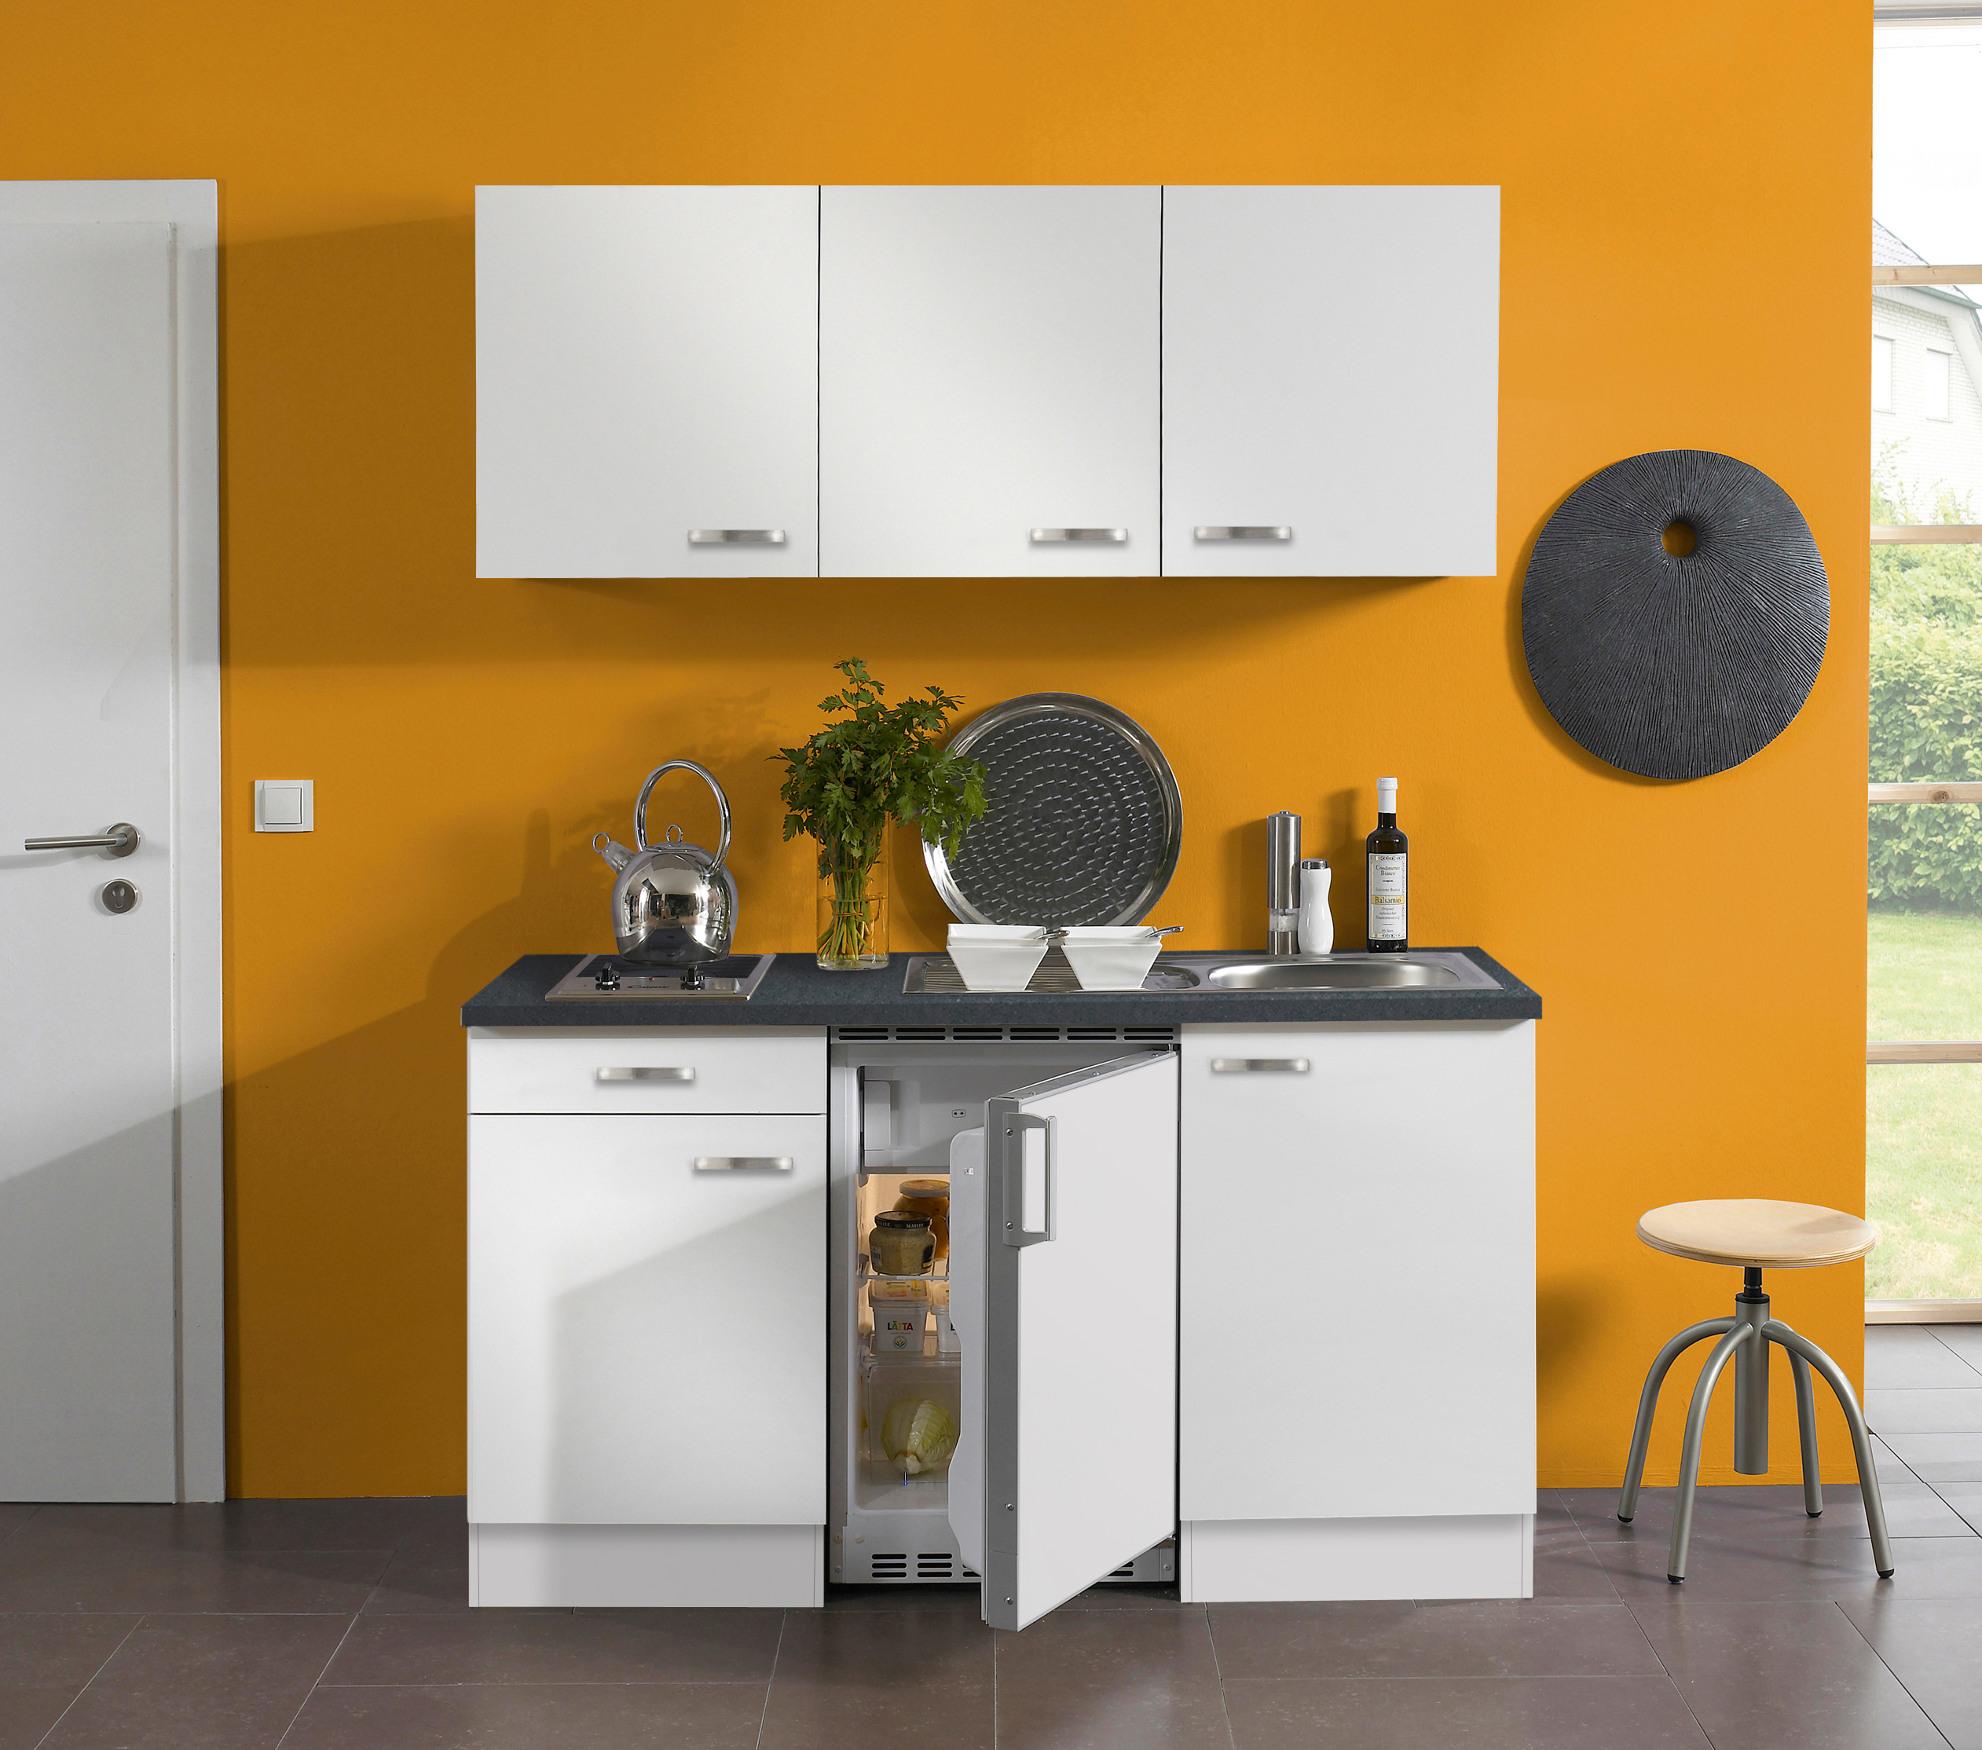 singlek che granada mit glaskeramik kochfeld 8 teilig. Black Bedroom Furniture Sets. Home Design Ideas